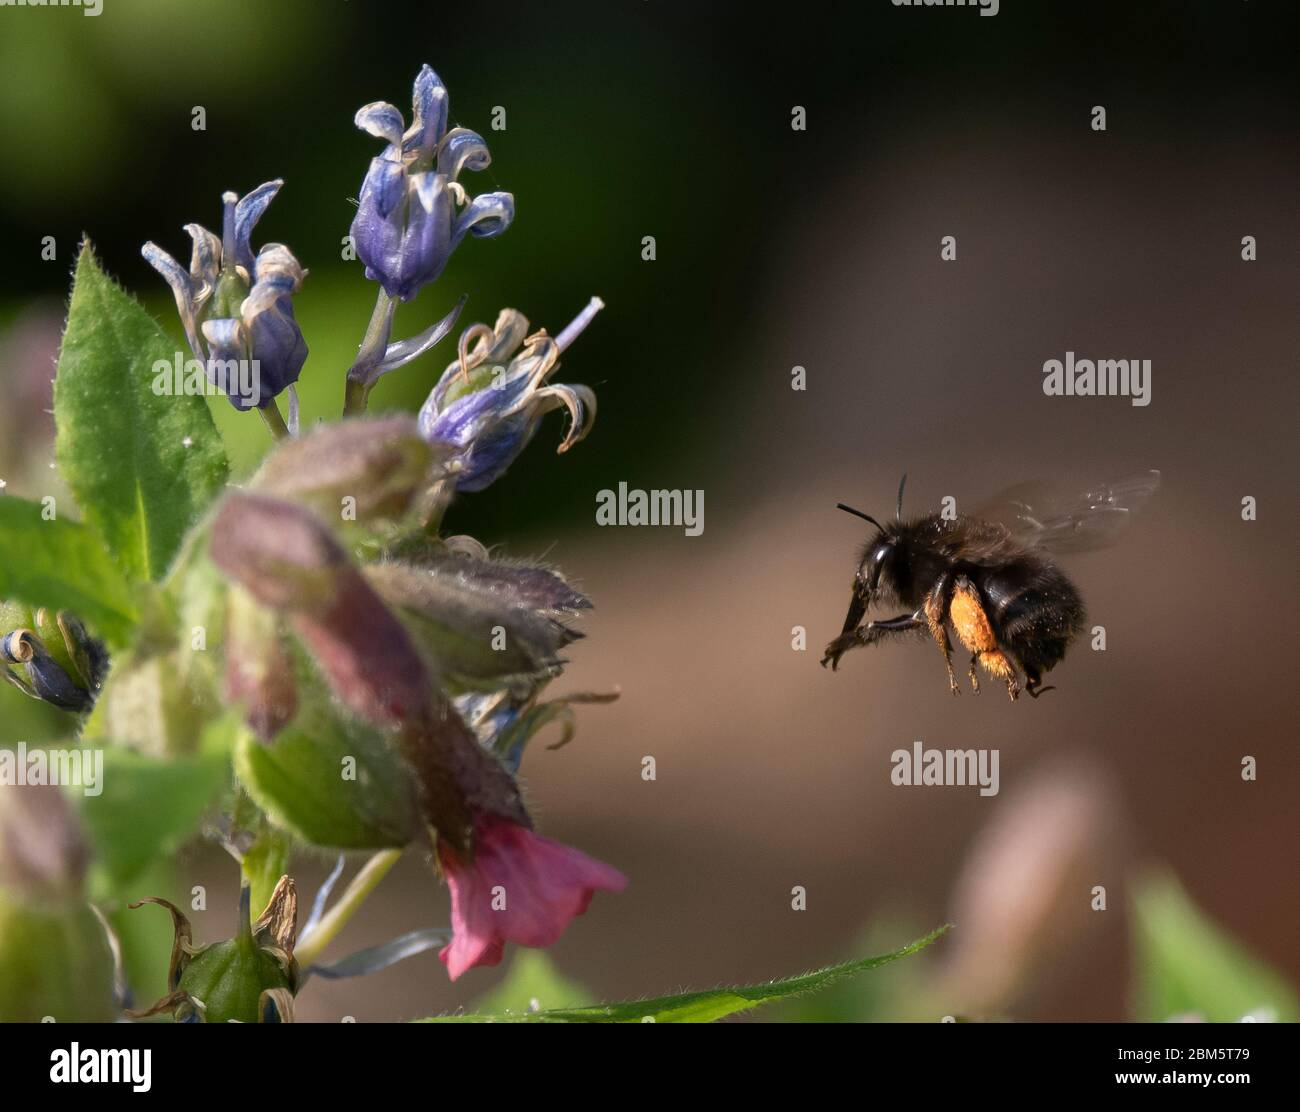 London, UK. 7 May 2020. Coronavirus lockdown day 45, garden watch. A Bumblebee laden with pollen flies towards bluebell flowers, frozen in mid flight. Credit: Malcolm Park/Alamy Live News Stock Photo